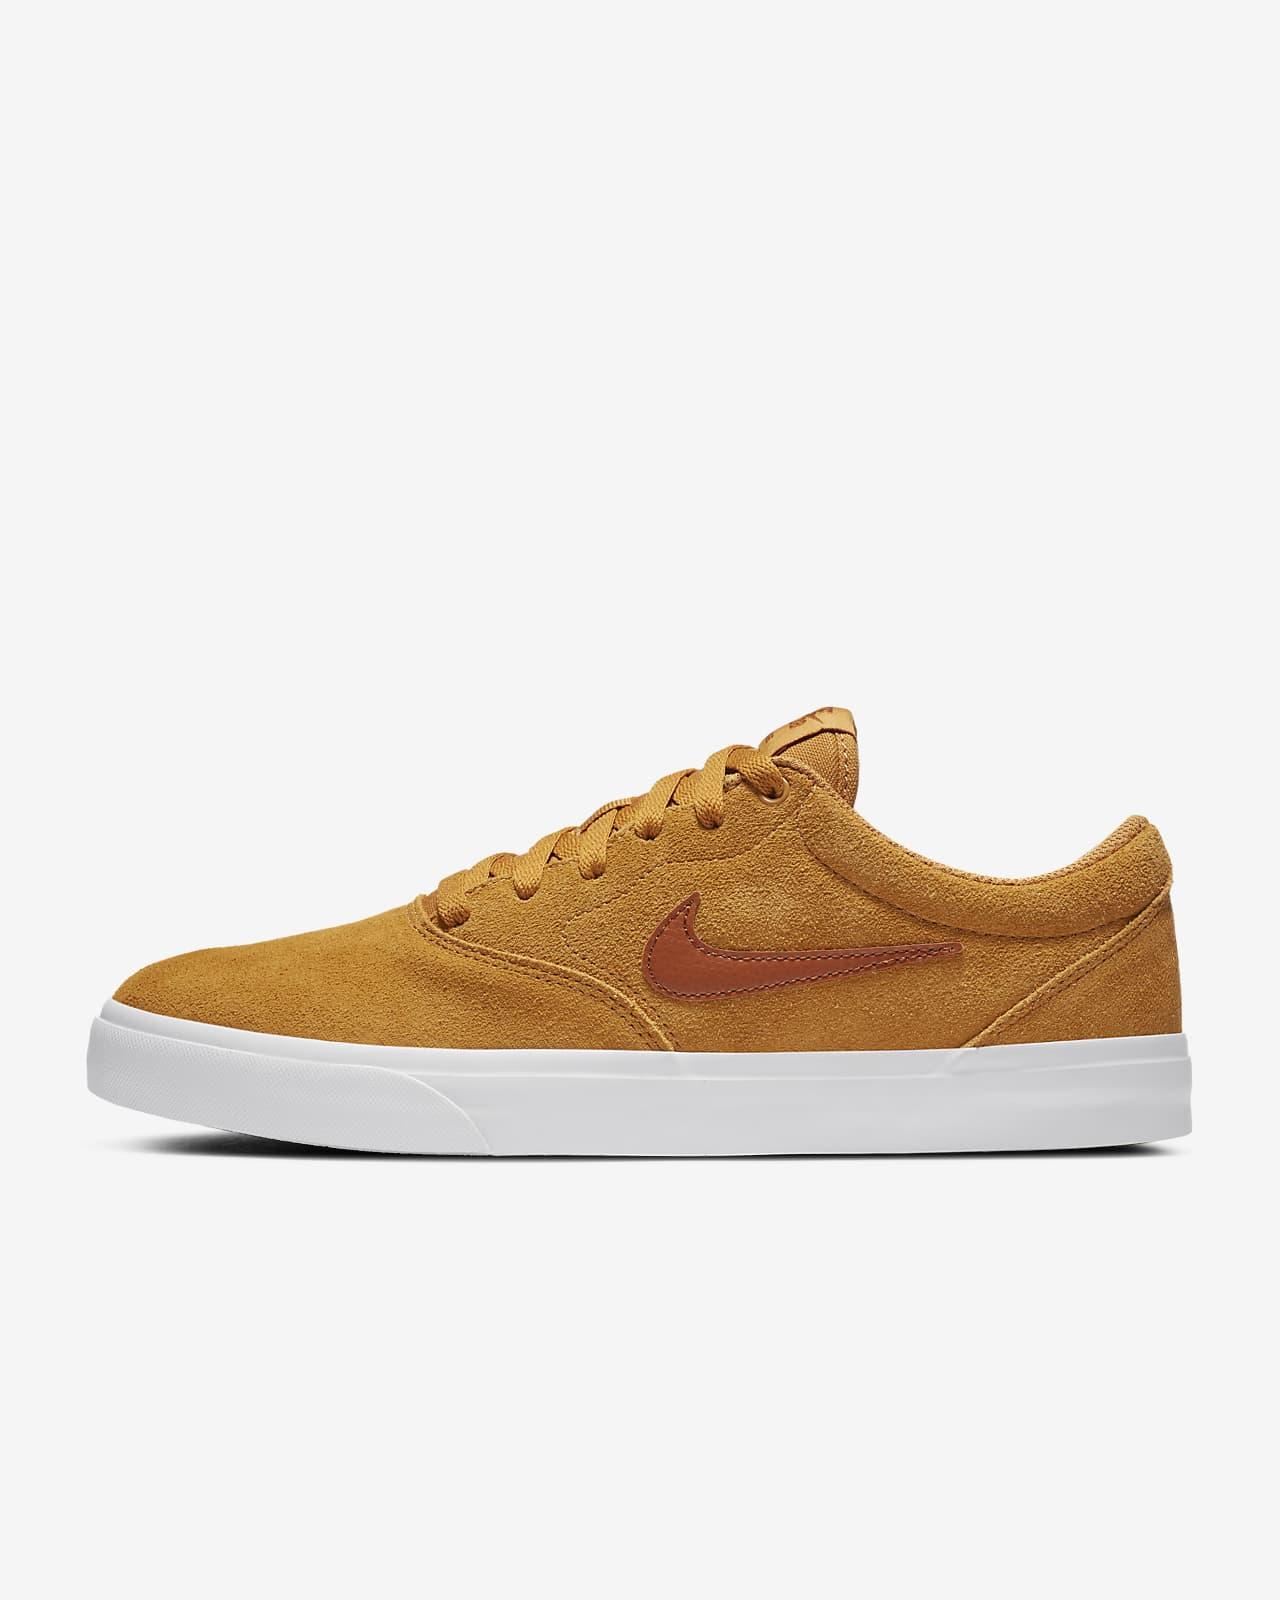 Calzado Skate de gamuza Nike SB Charge